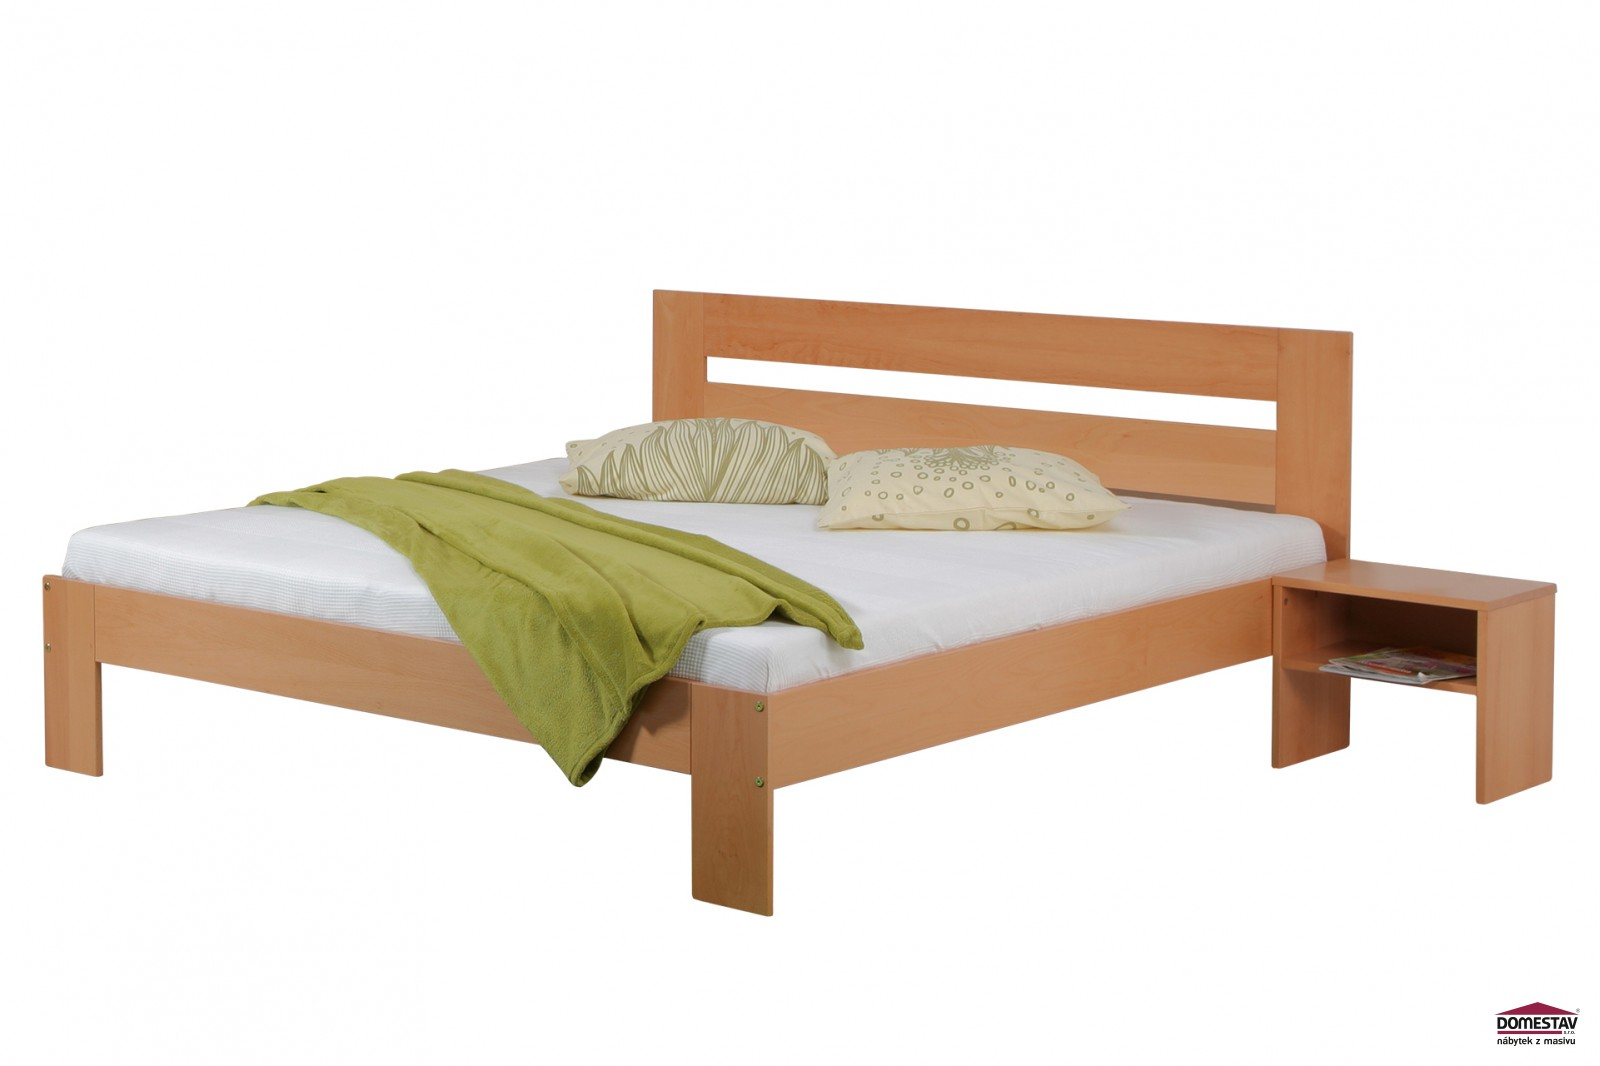 1119acb24195 Domestav manželská postel METAXA 180 cm buk cink